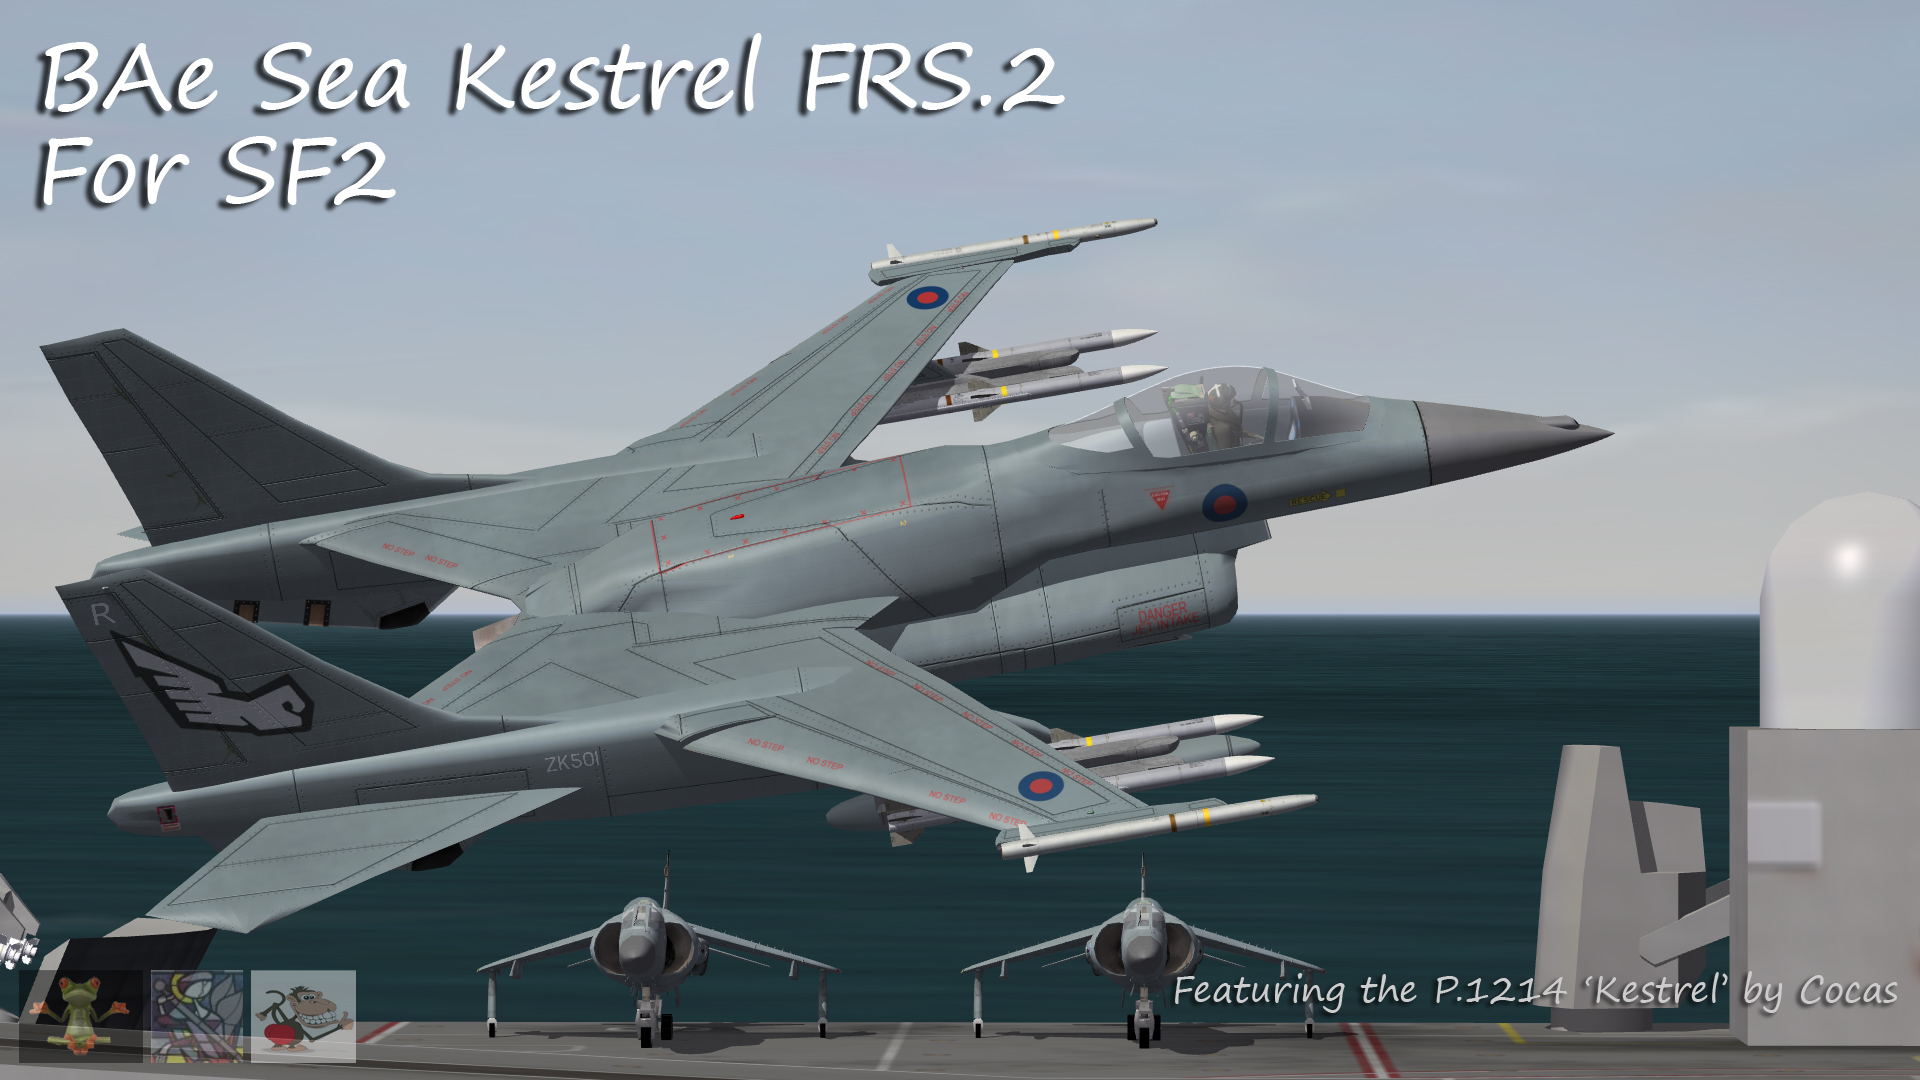 Royal Navy Sea Kestrel FRS1 & FRS.2 by Cocas - V2.0